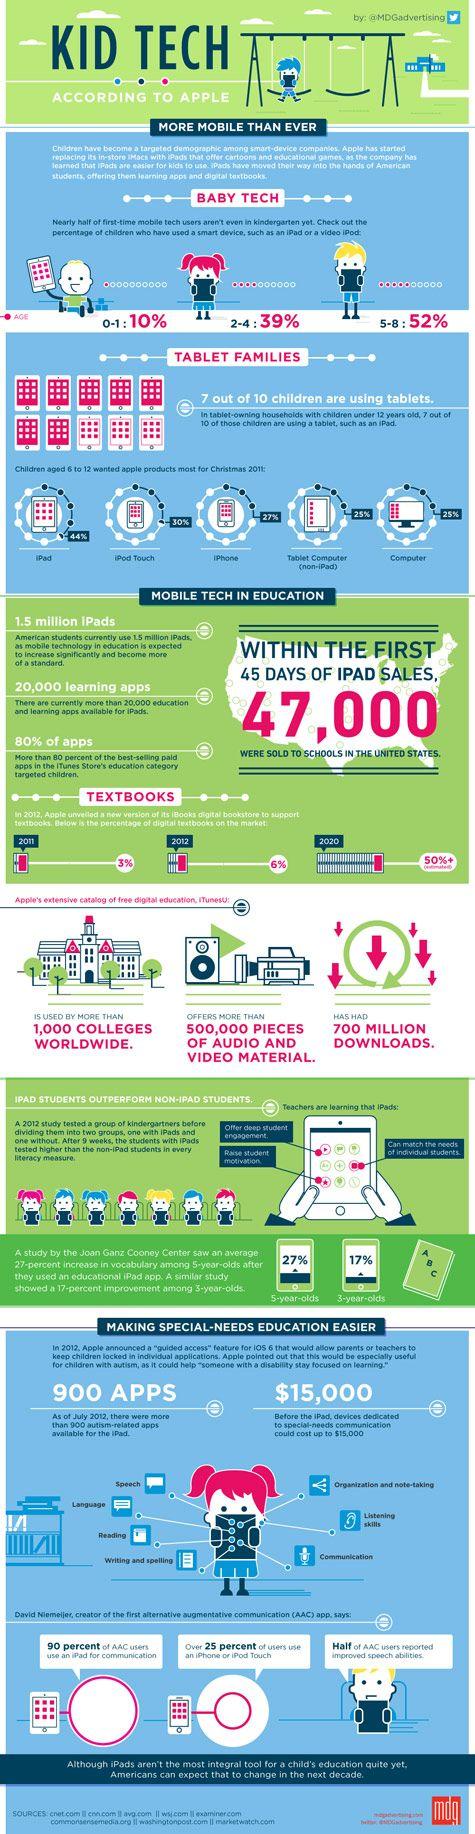 iPad sint he classroom infographic